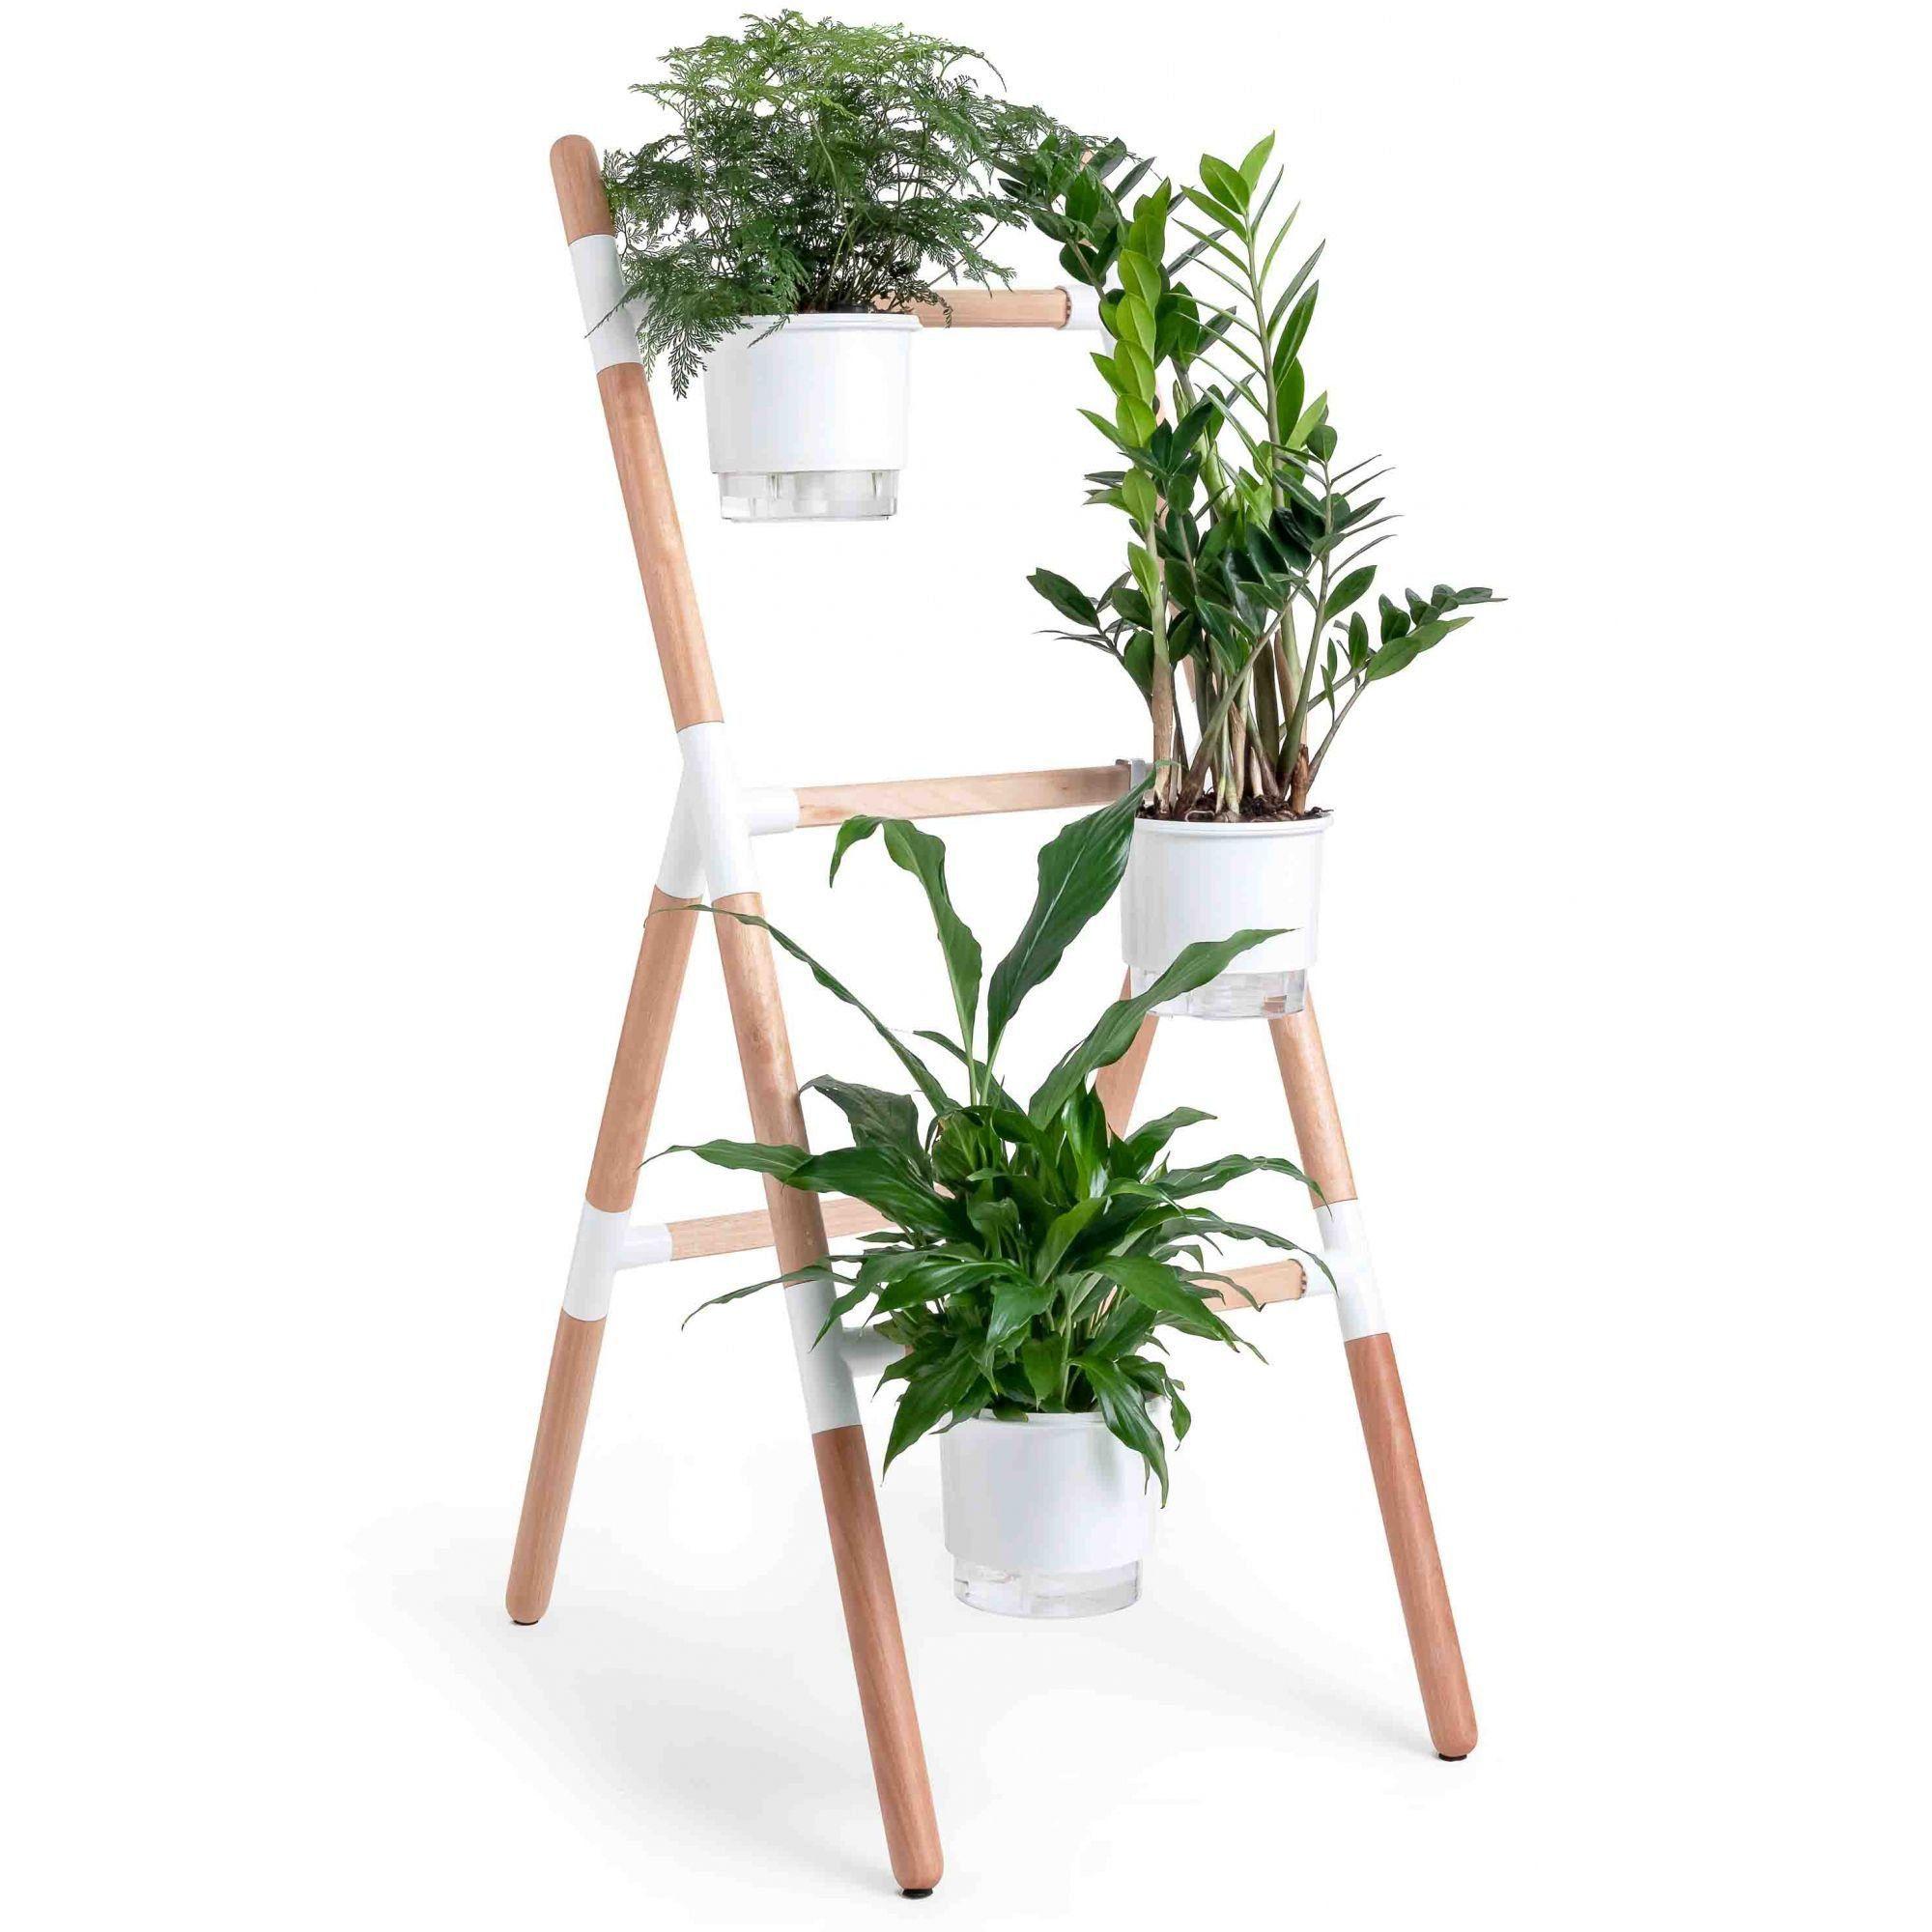 Kit Horta Vertical Escada Eleve Raiz 3 Níveis Branco